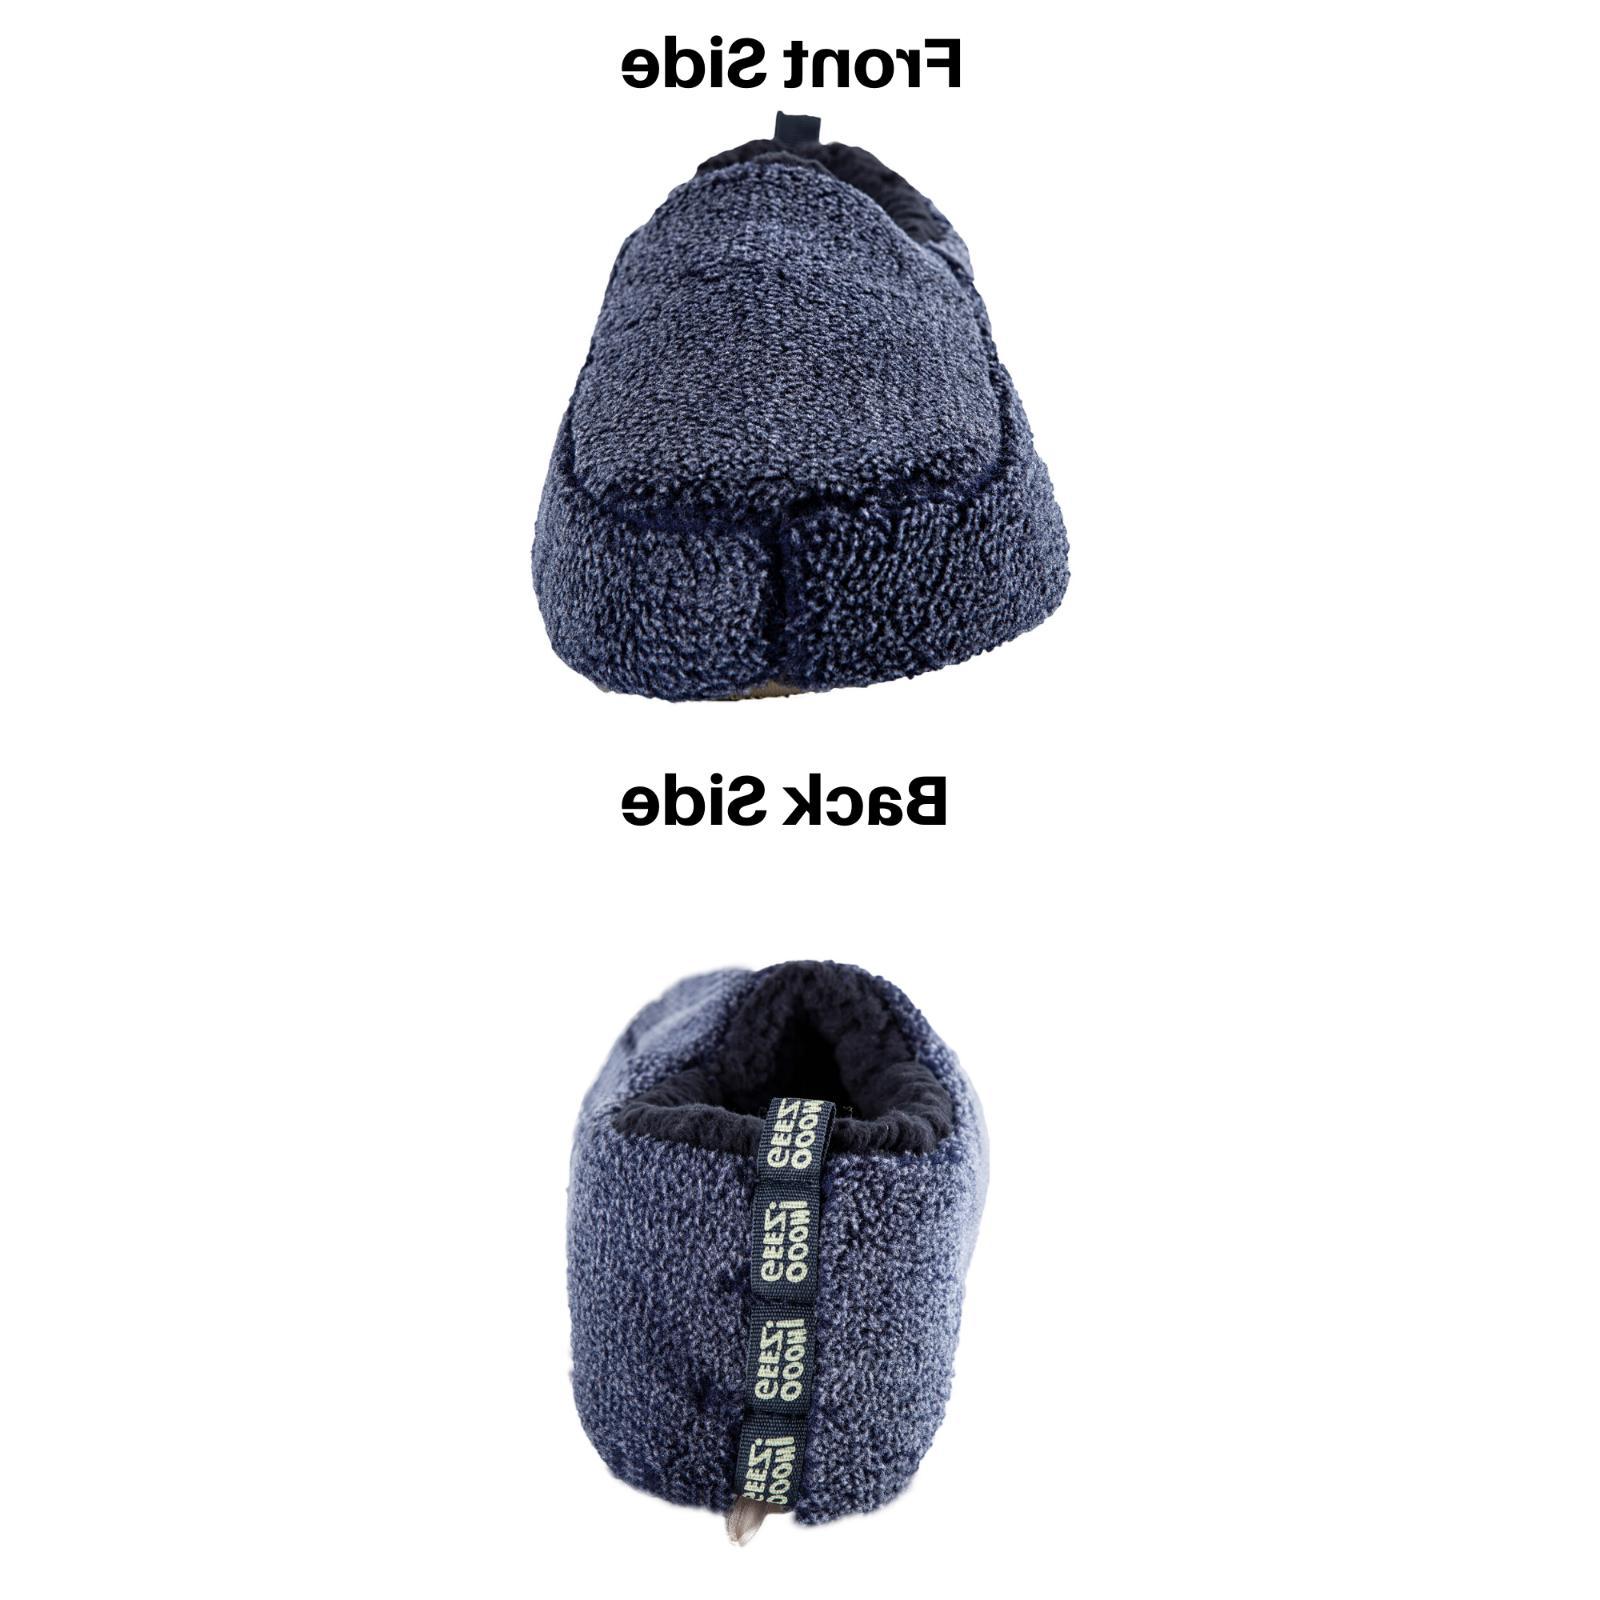 Men's Slippers Cozy Comfort Fuzzy Fluffy Indoor Warm Anti-Skid